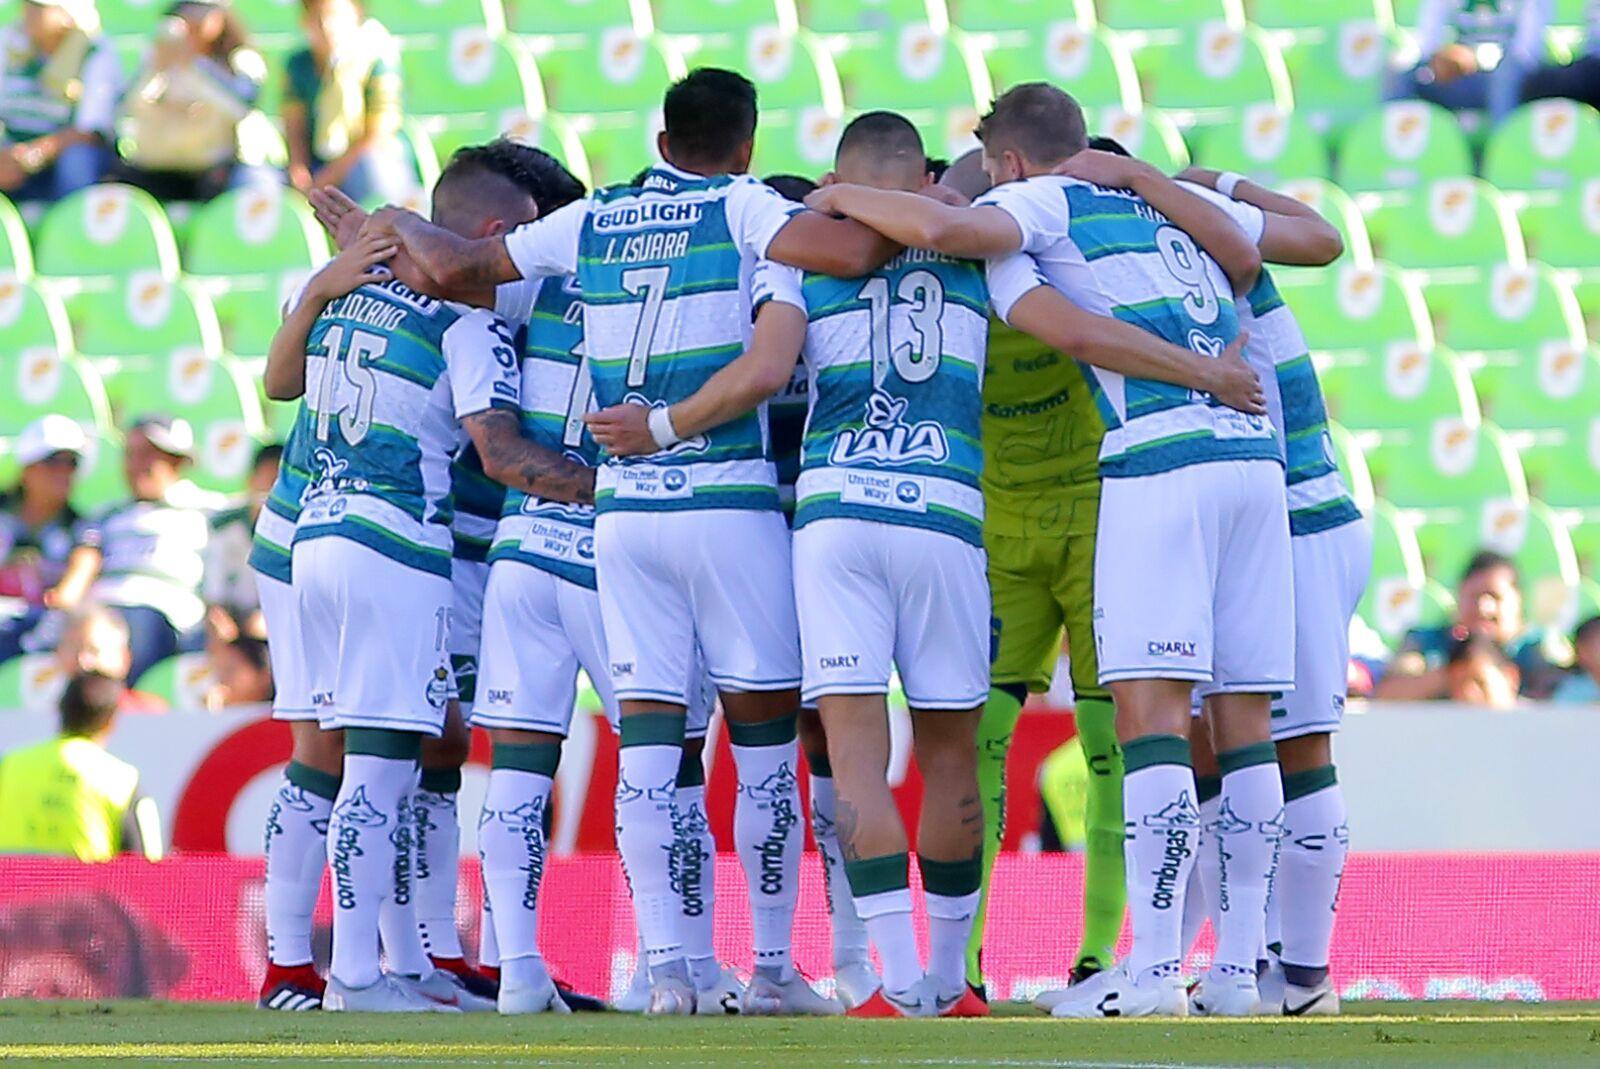 Liga MX: Santos Laguna hopes to regroup against Necaxa